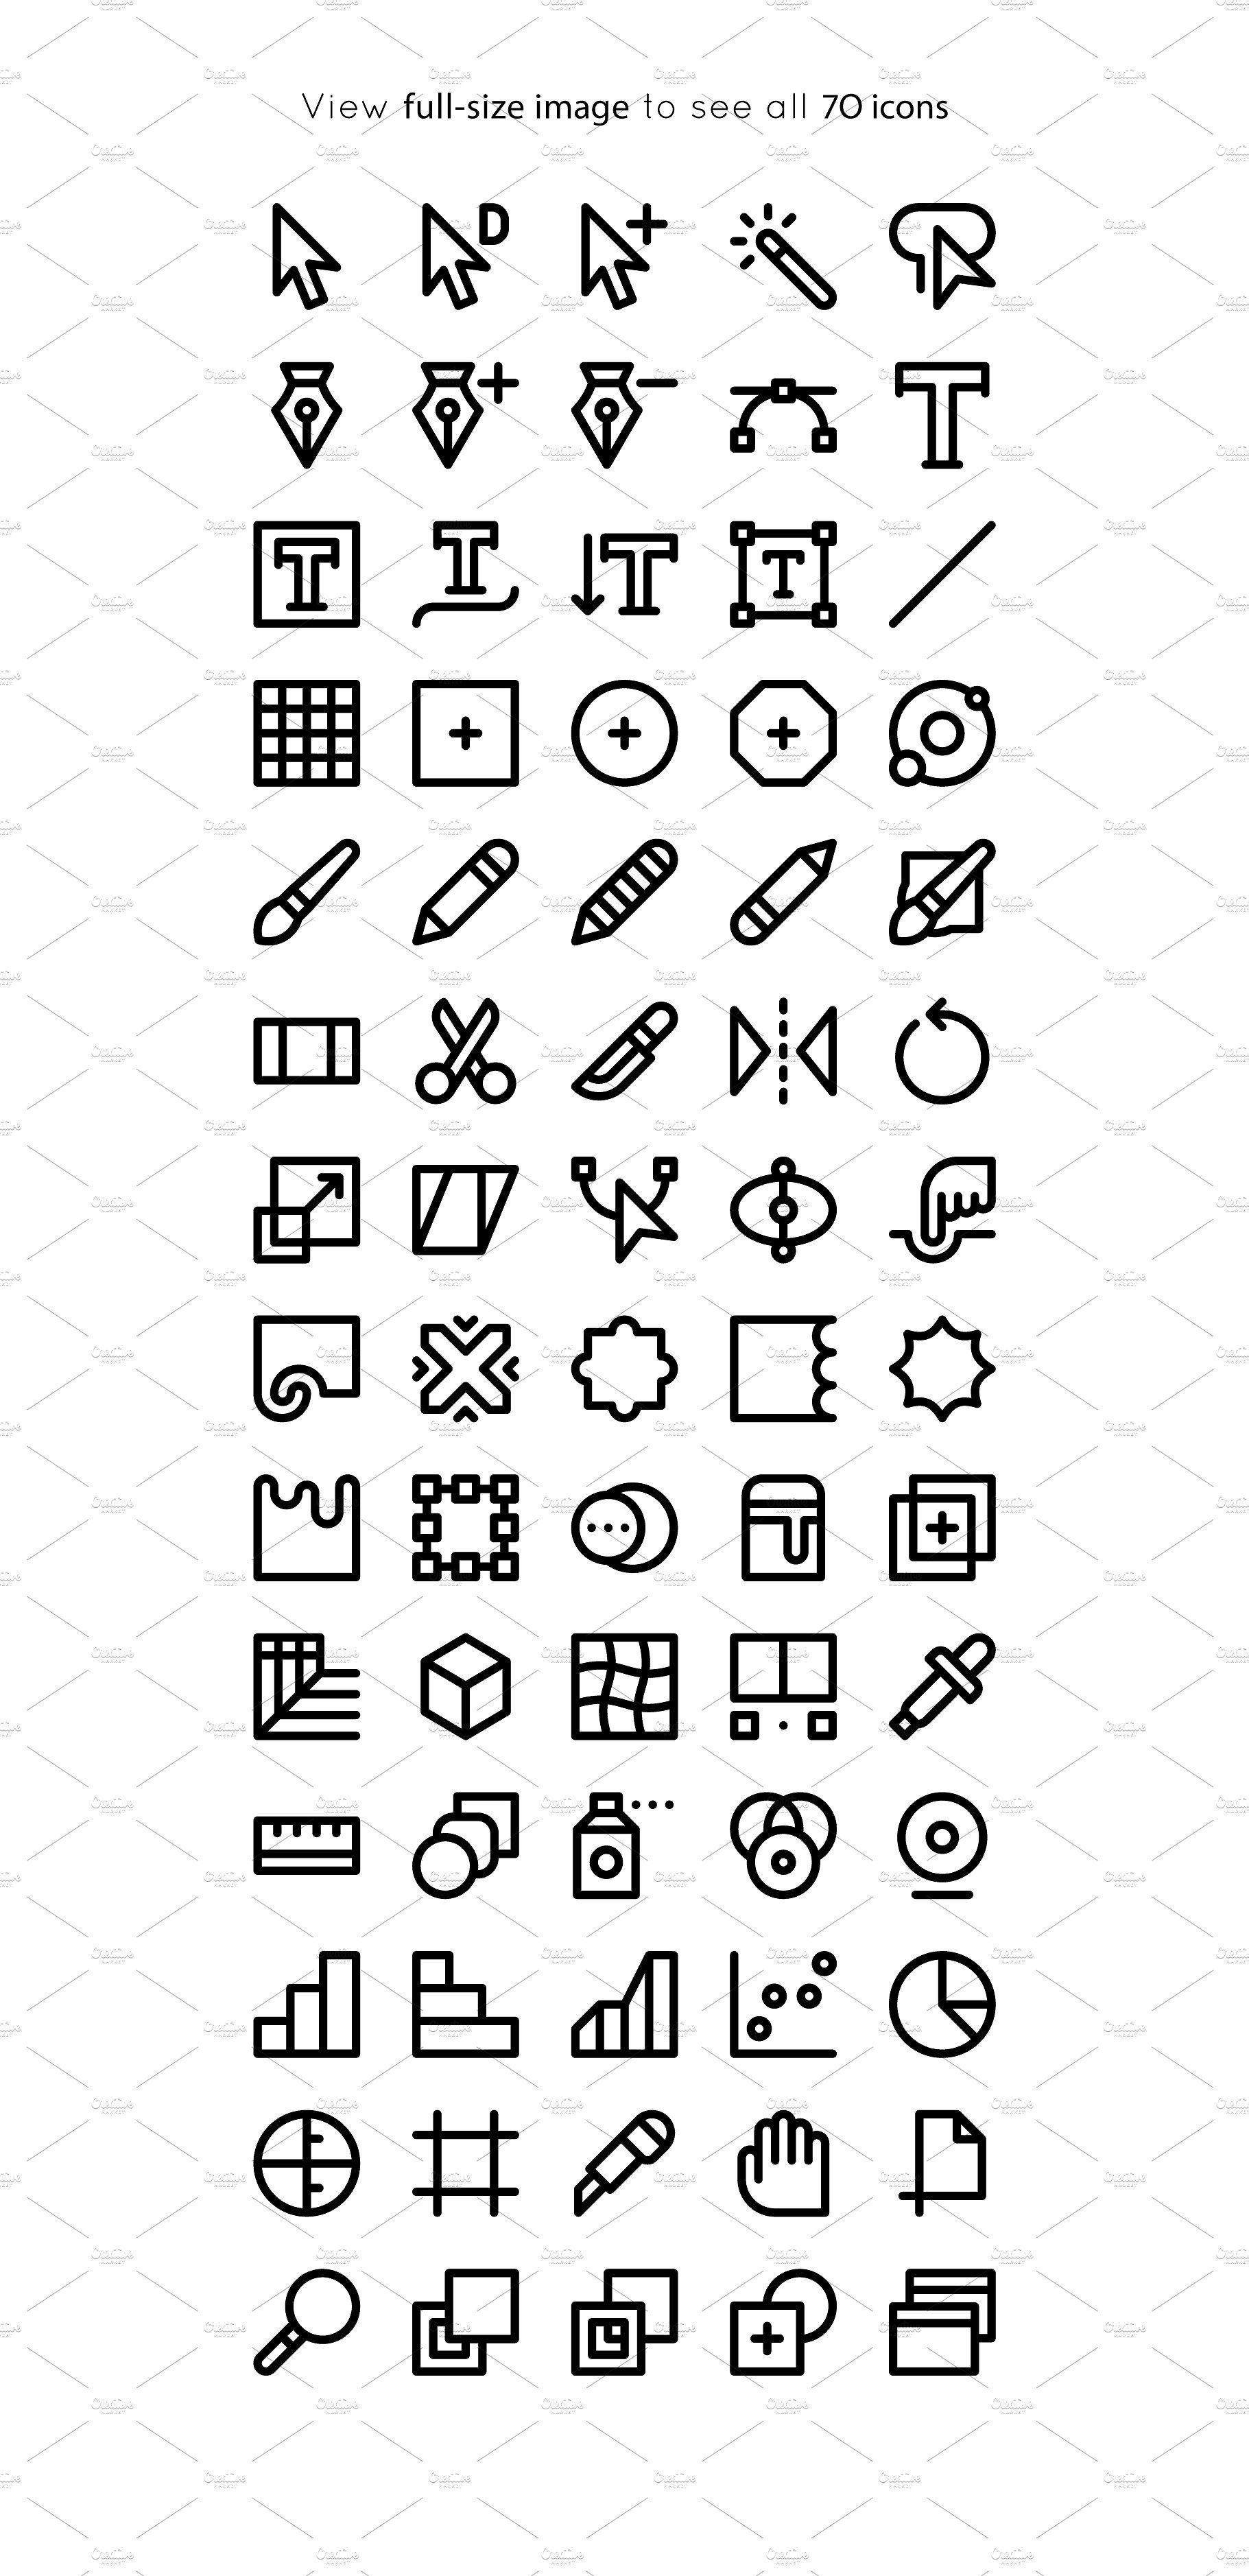 BOLD Adobe Illustrator tool icons Adobe illustrator